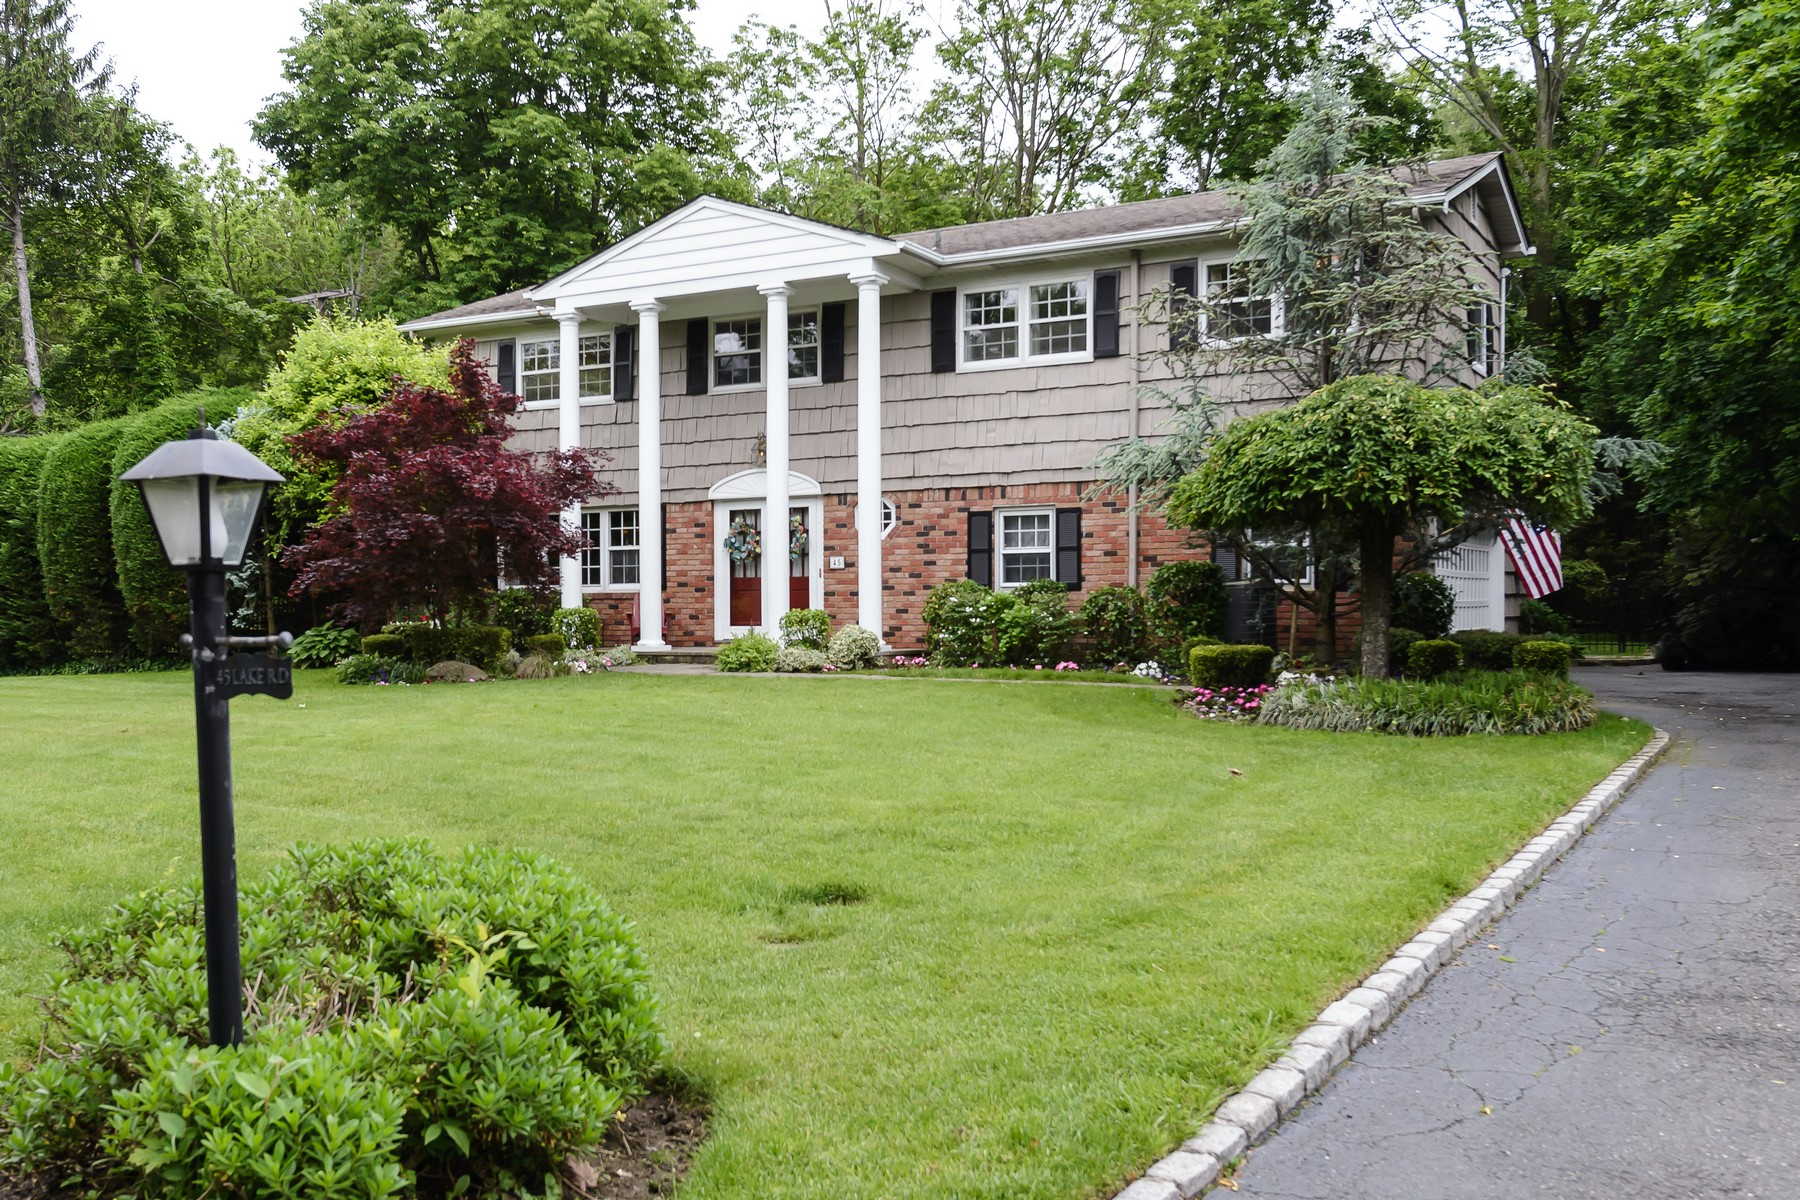 独户住宅 为 销售 在 Spacious Colonial with Beach Rights 45 Lake Rd 曼哈塞特, 纽约州, 11030 美国